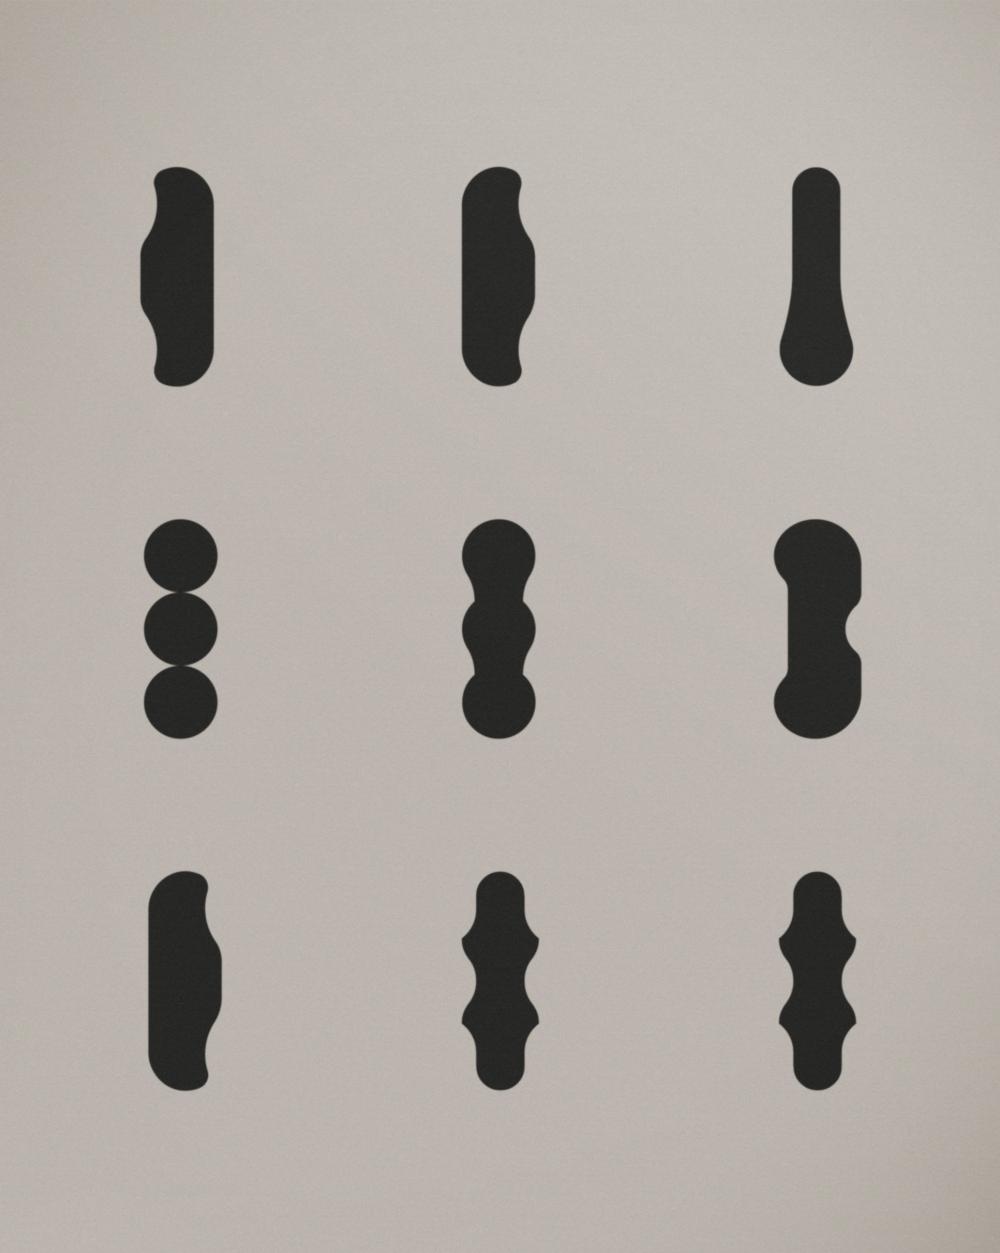 BEIGE 002, Acrylic on Linen (2017), 70x90 cm